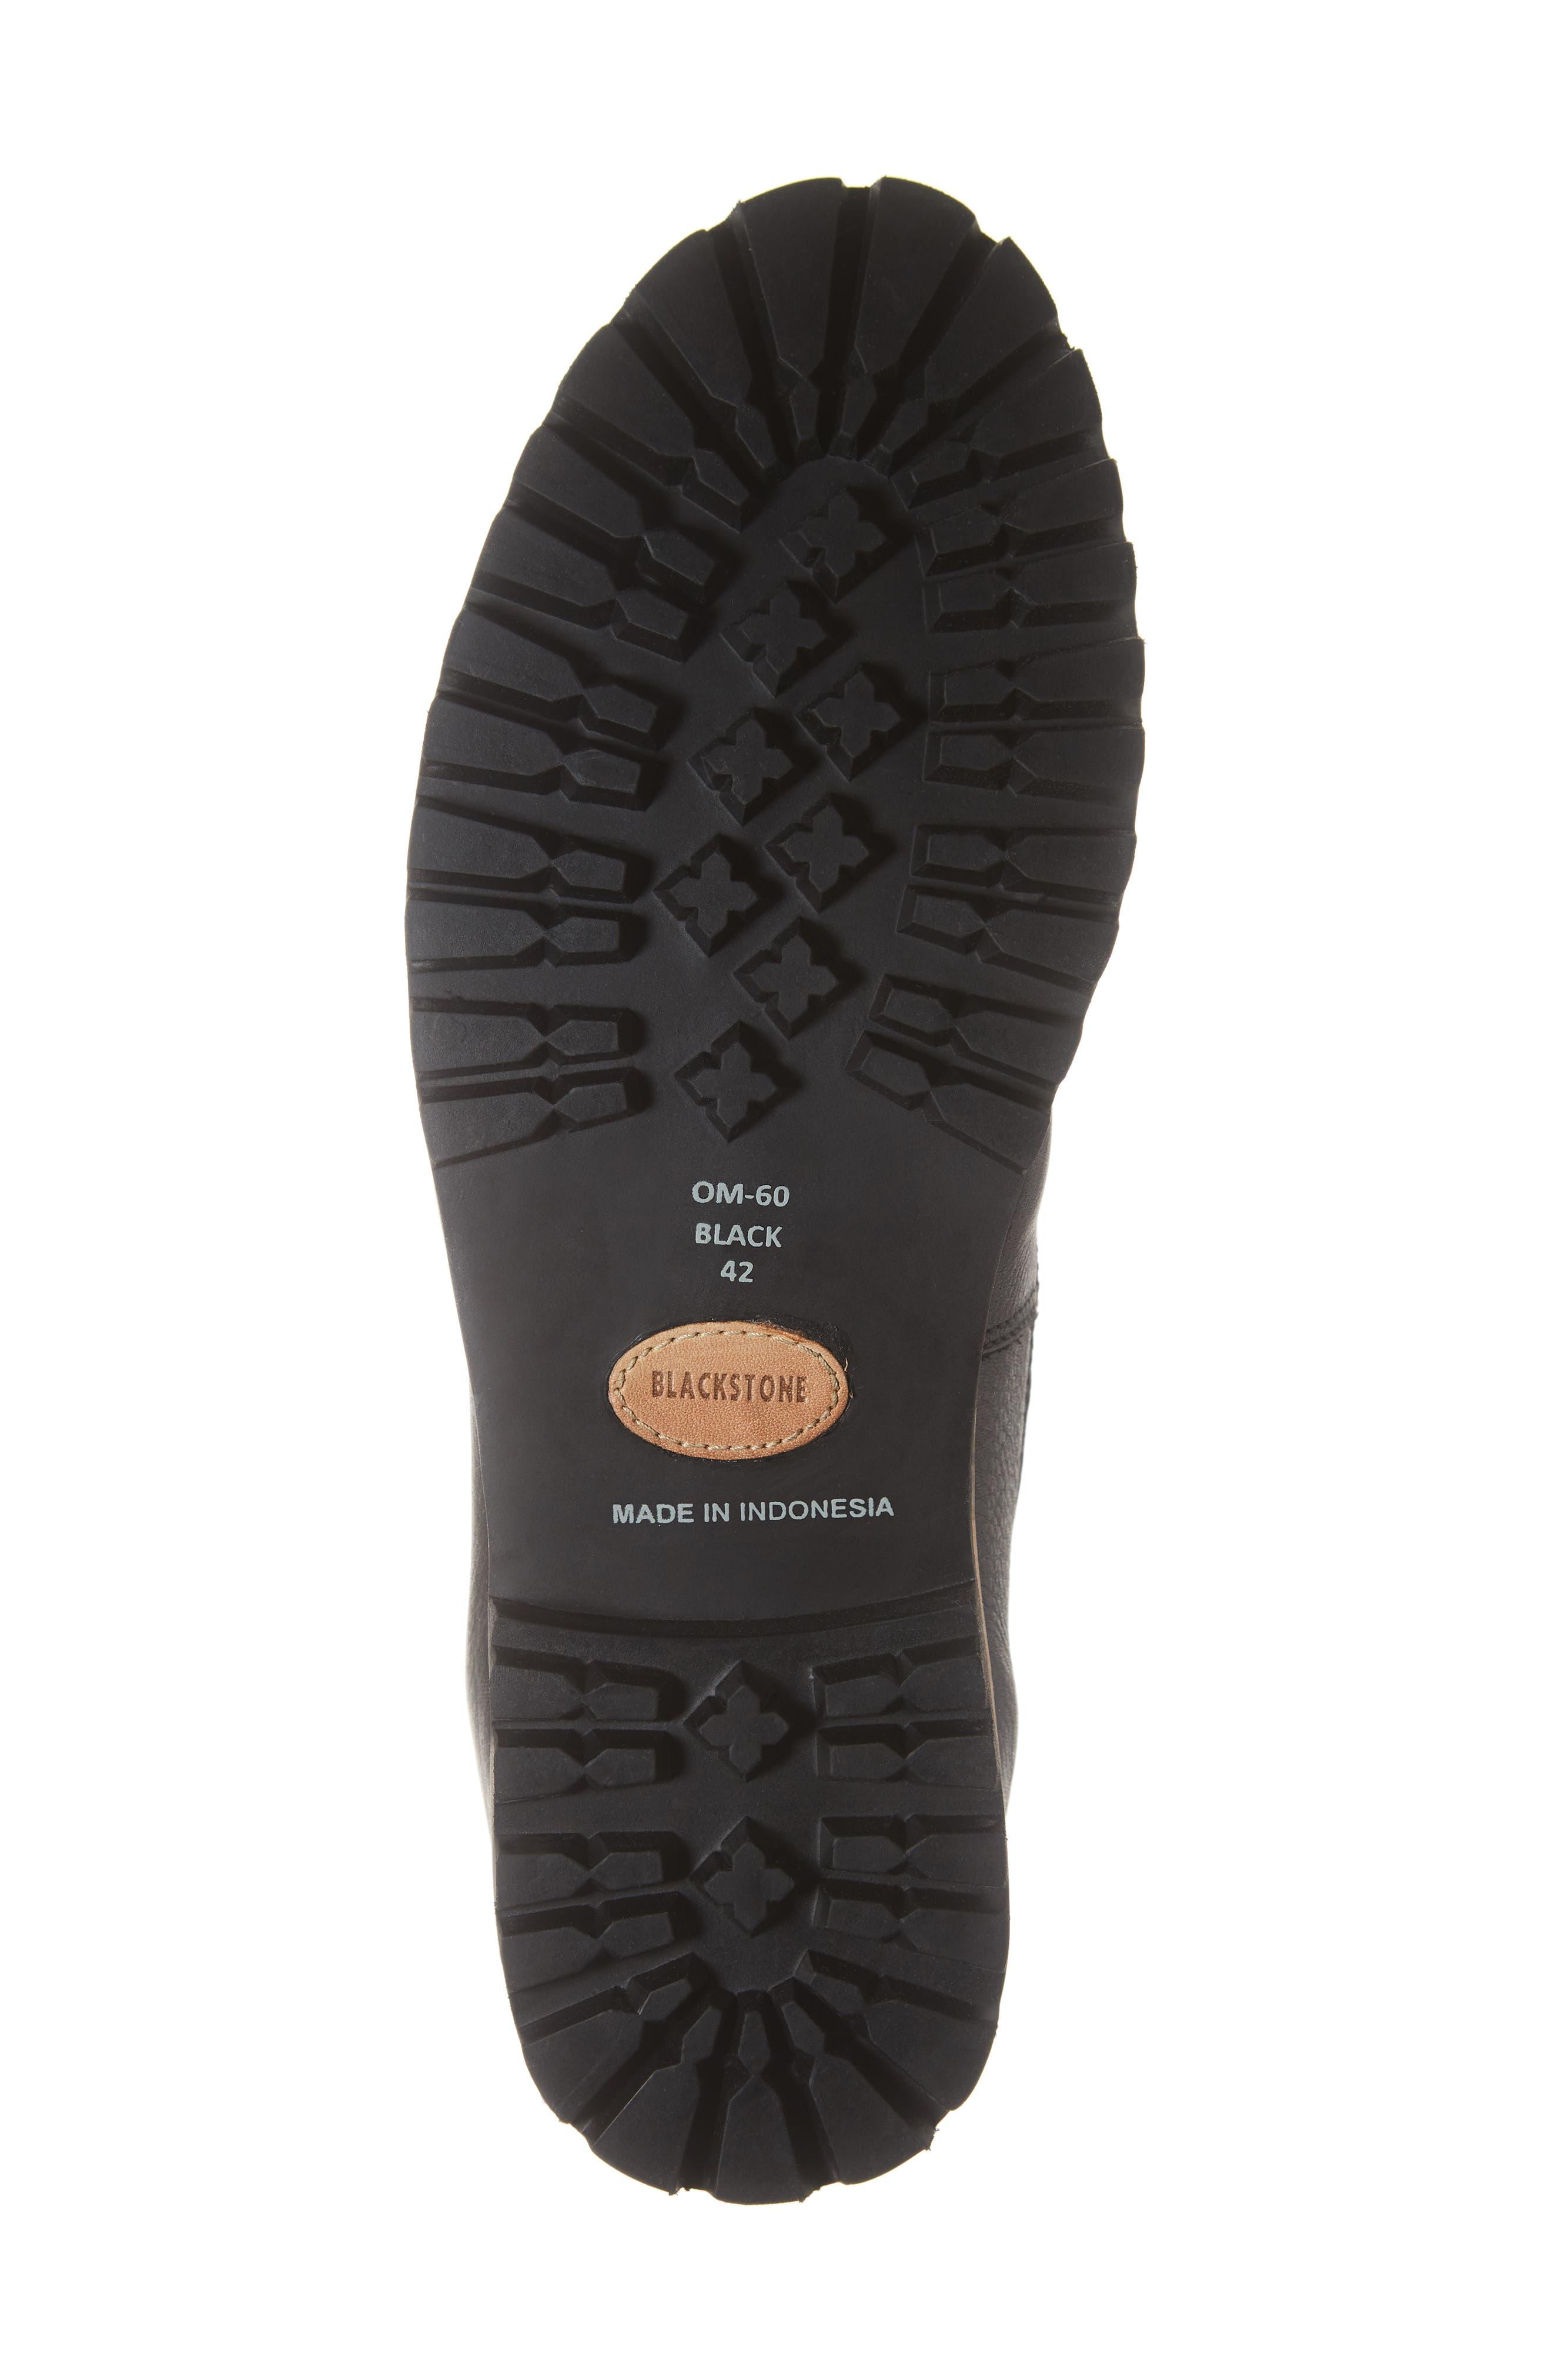 OM60 Waterproof Genuine Shearling Boot,                             Alternate thumbnail 6, color,                             BLACK